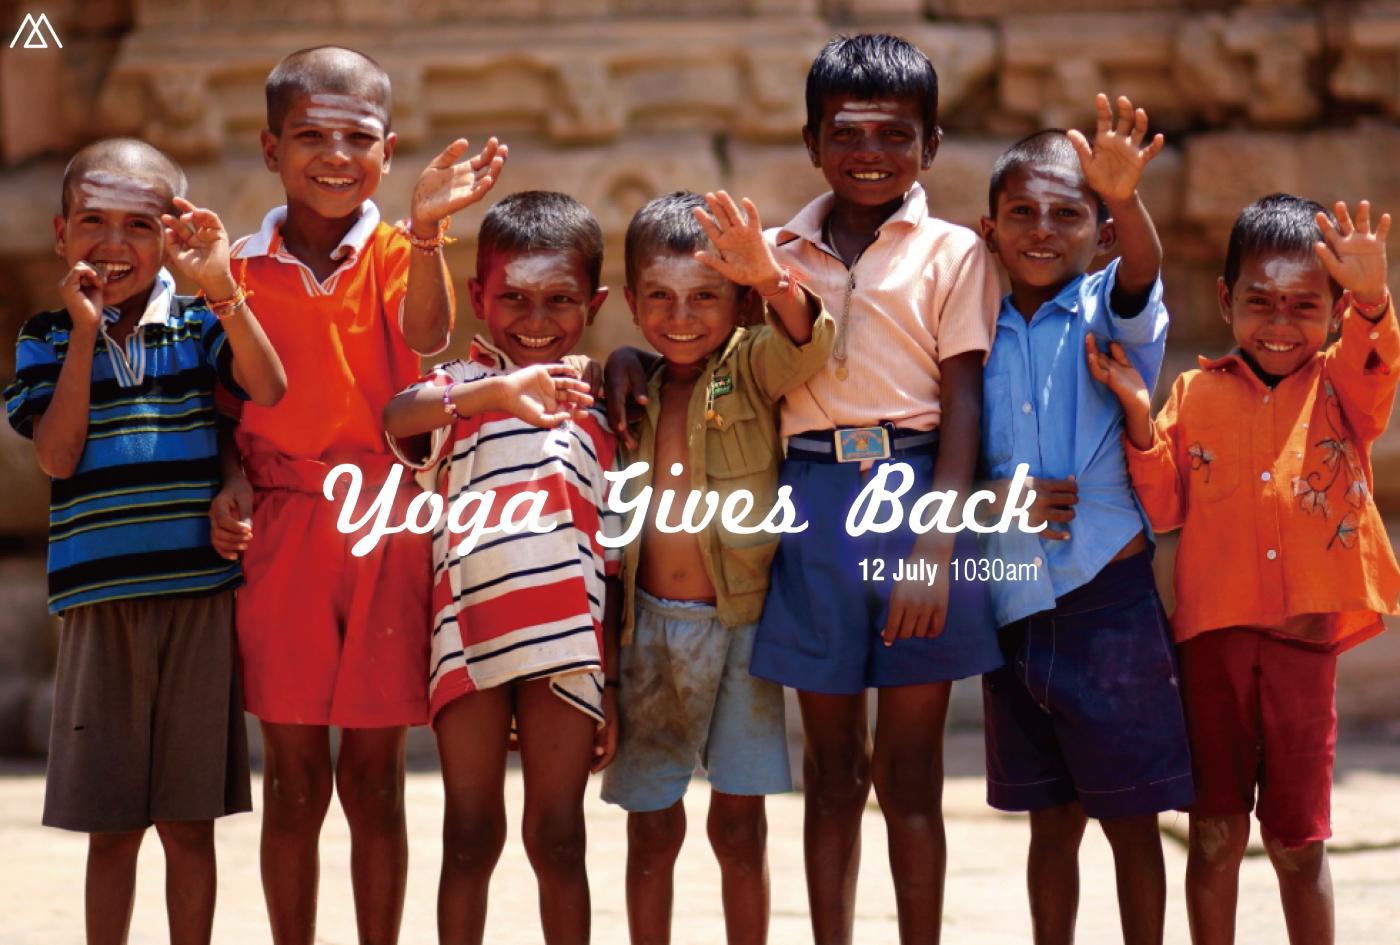 yoga gives back